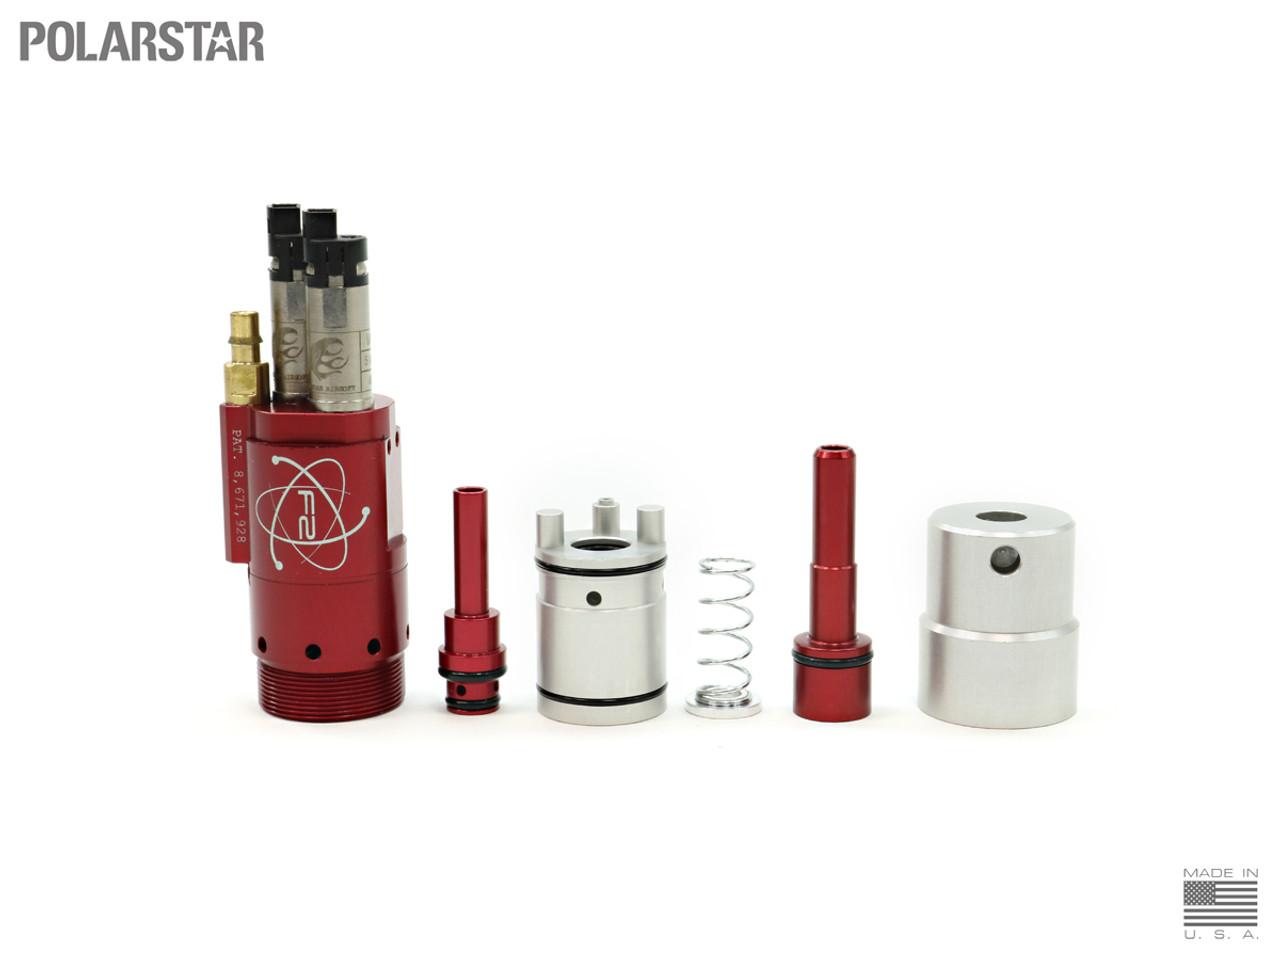 Polarstar Airsoft F2 with Full FCU - V2 -- Players Kit